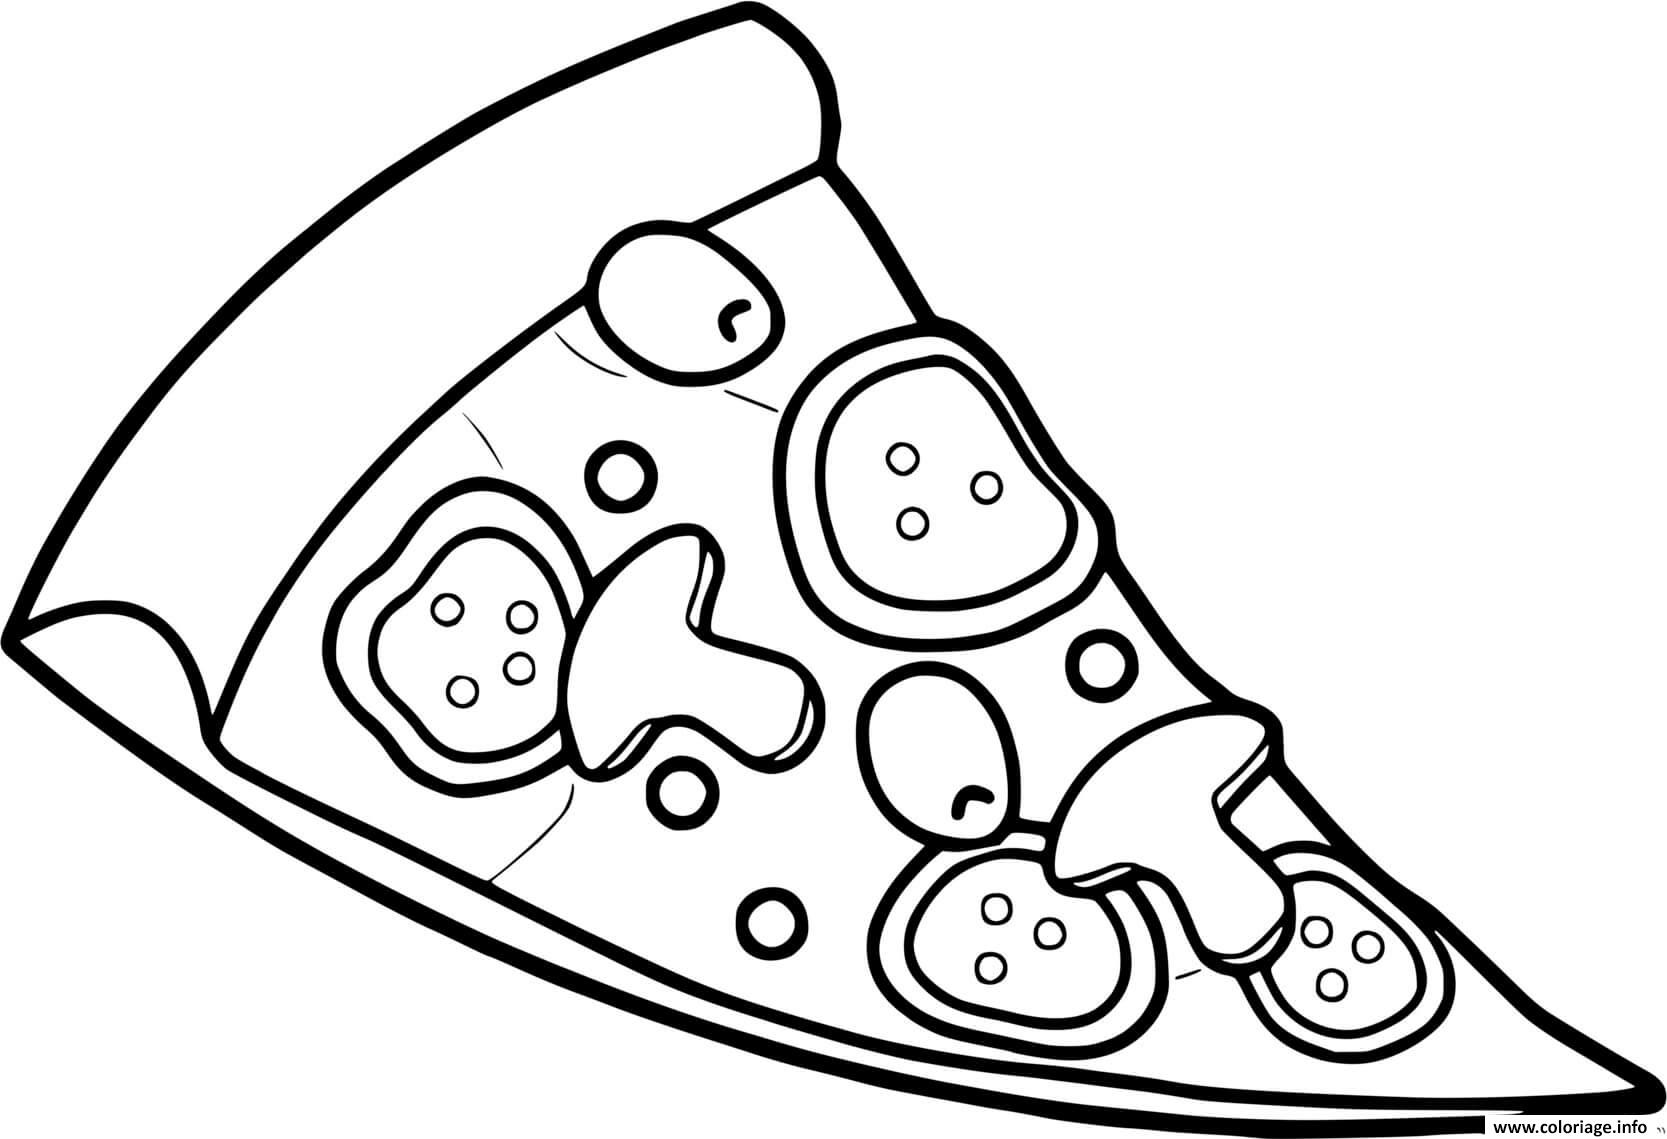 Dessin pizza tomate champignon Coloriage Gratuit à Imprimer